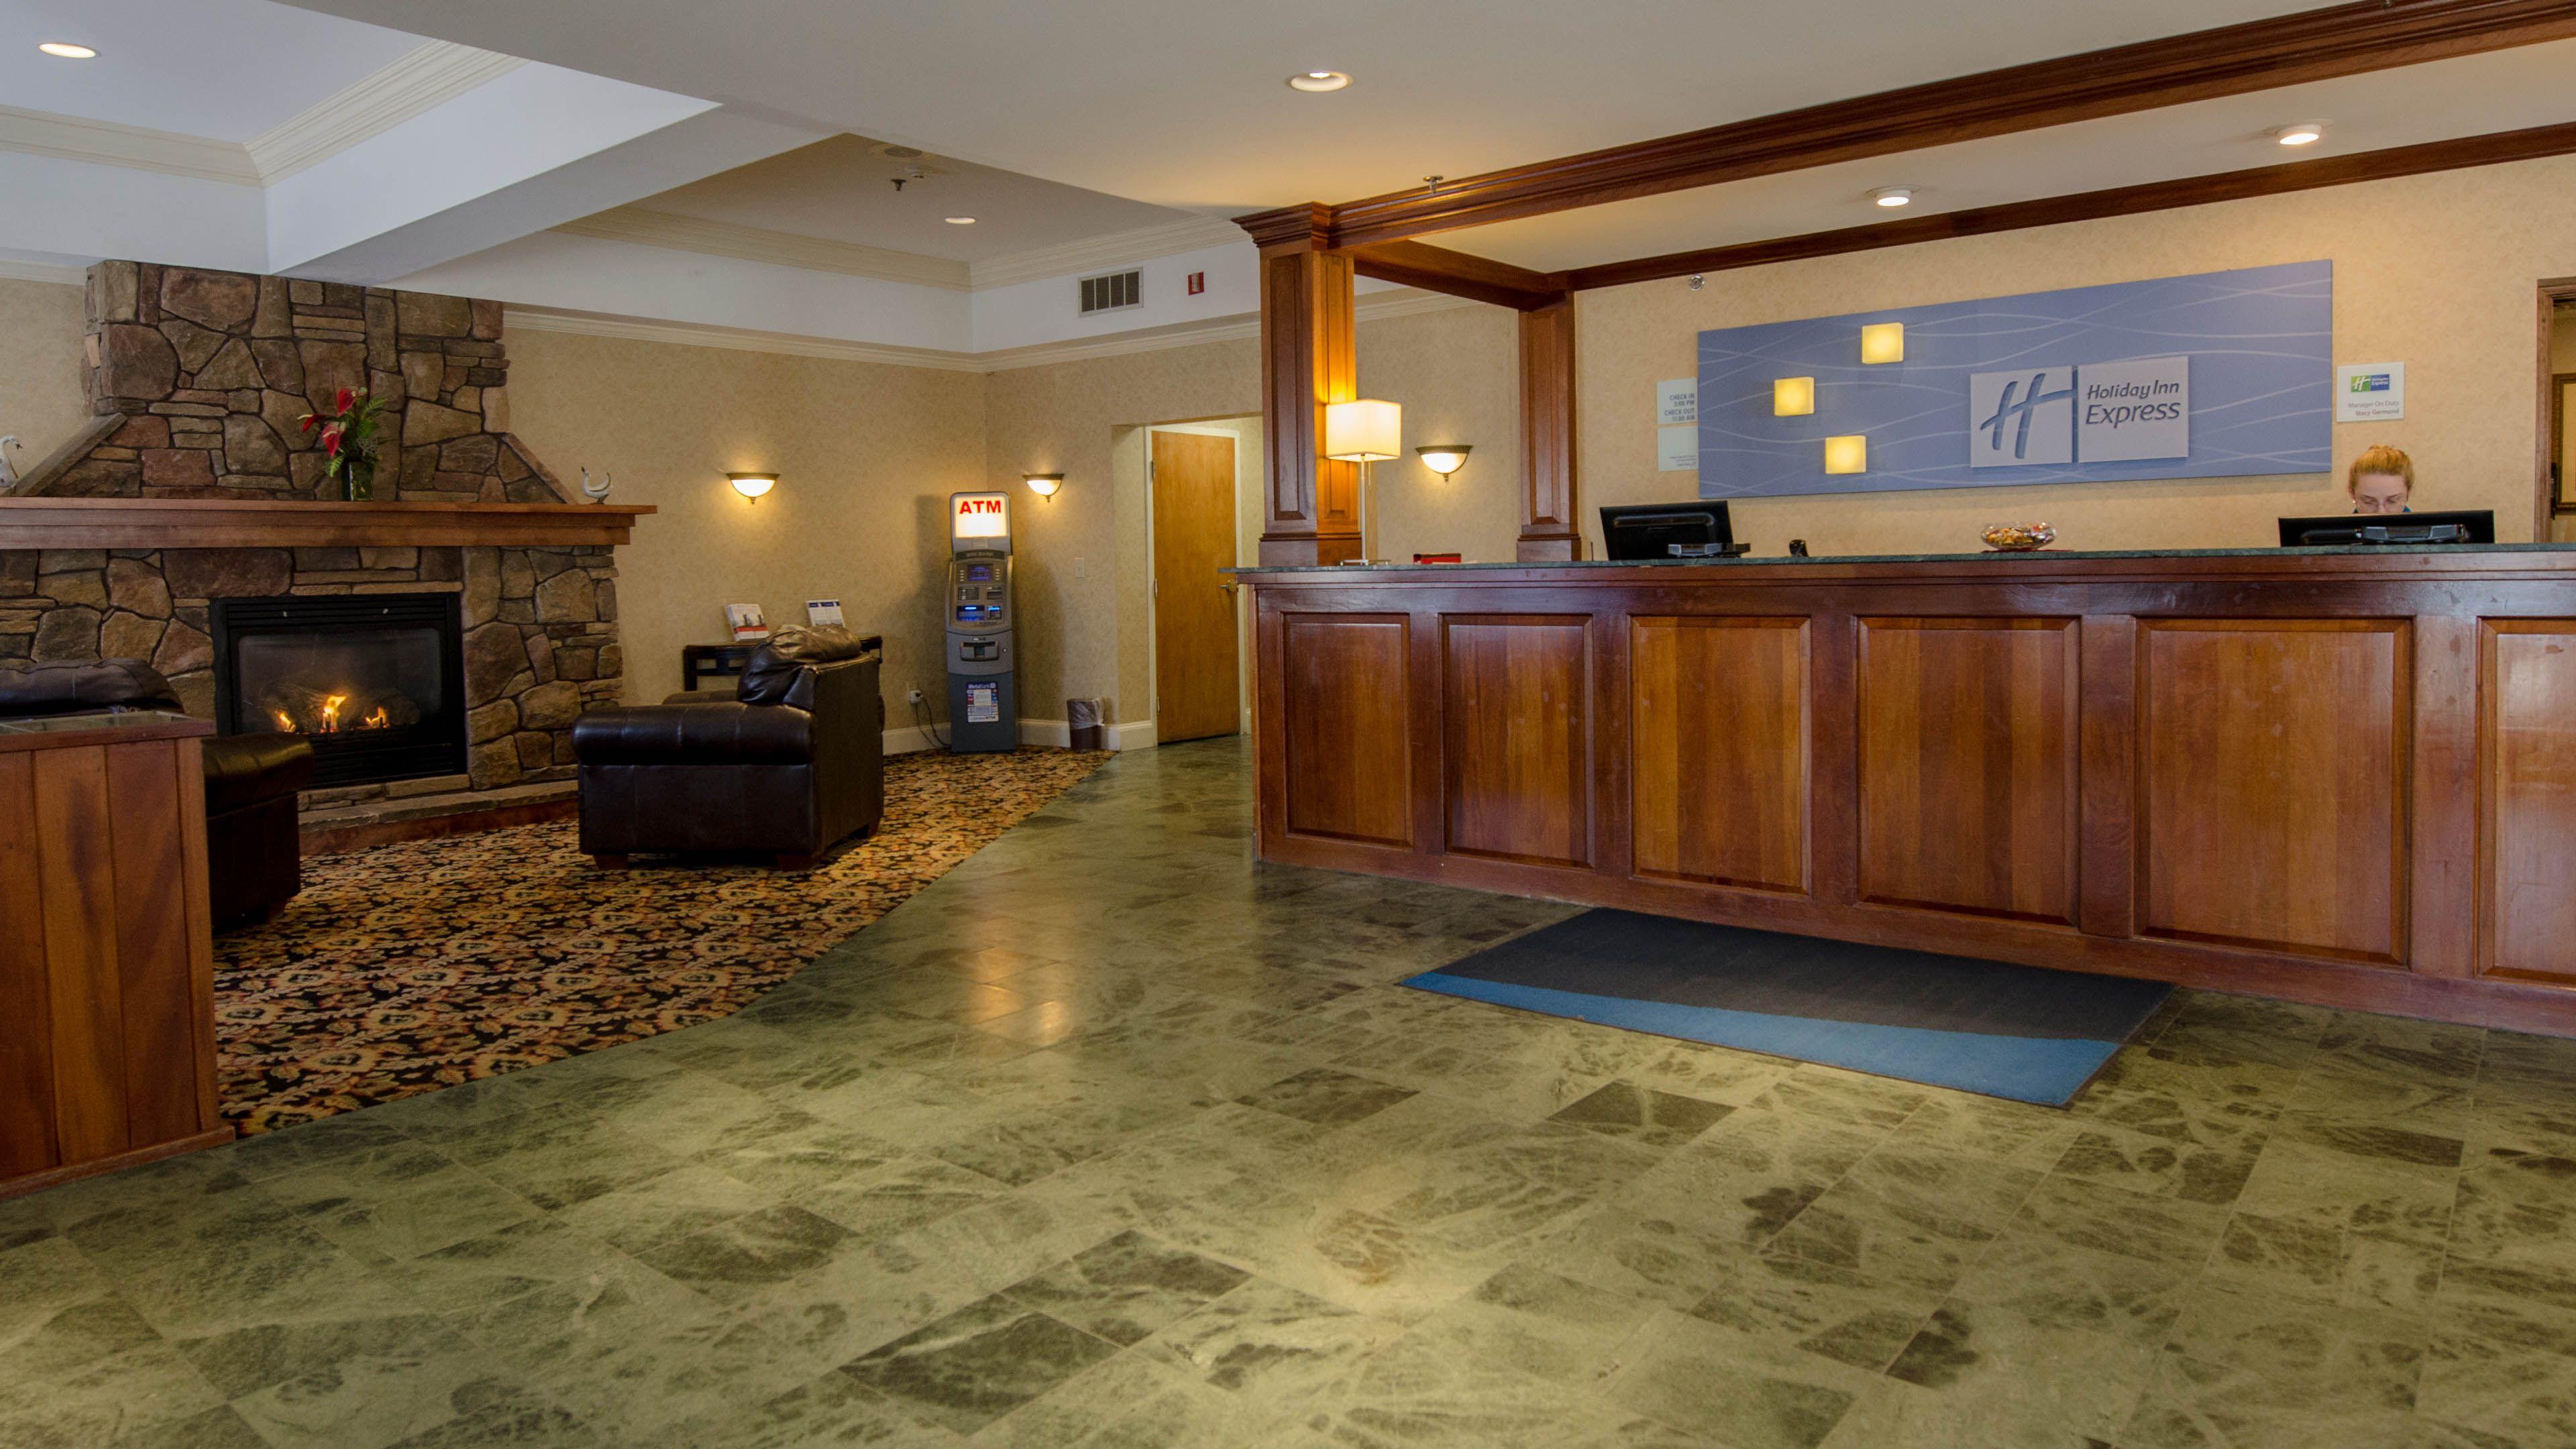 ... Holiday Inn Express South Burlington For Garden Supply Company Vt ...